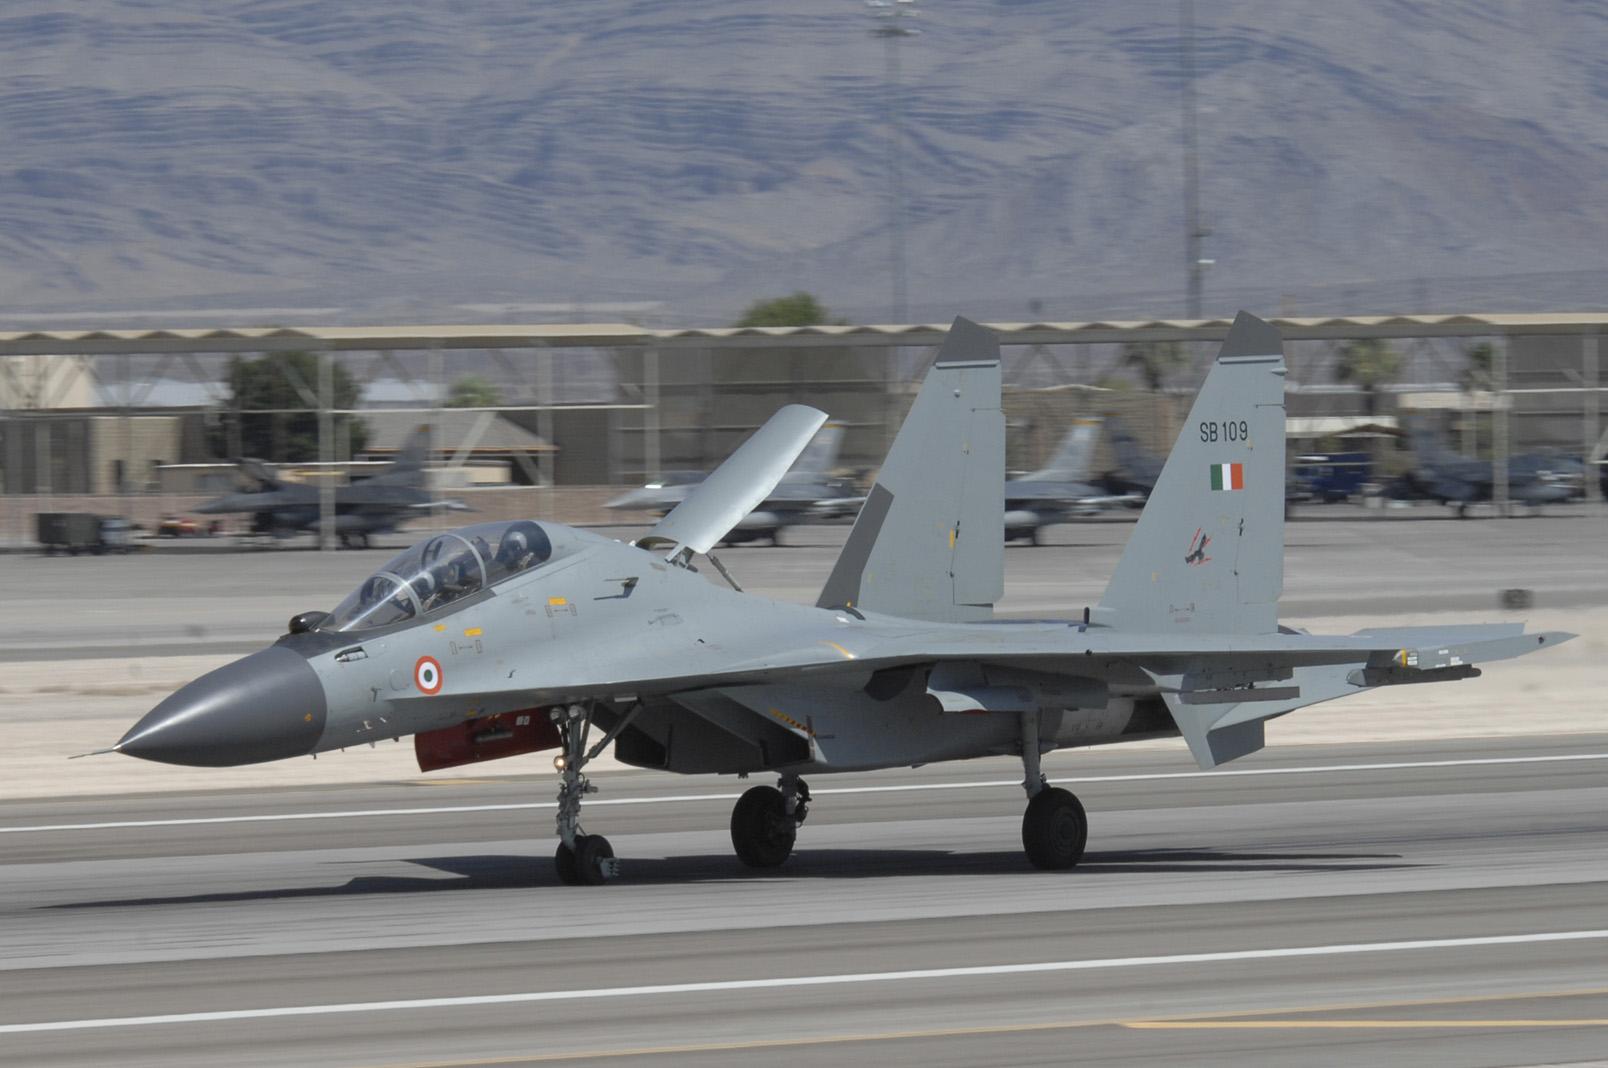 File:Indian Air Force SU-30.JPG - Wikipedia